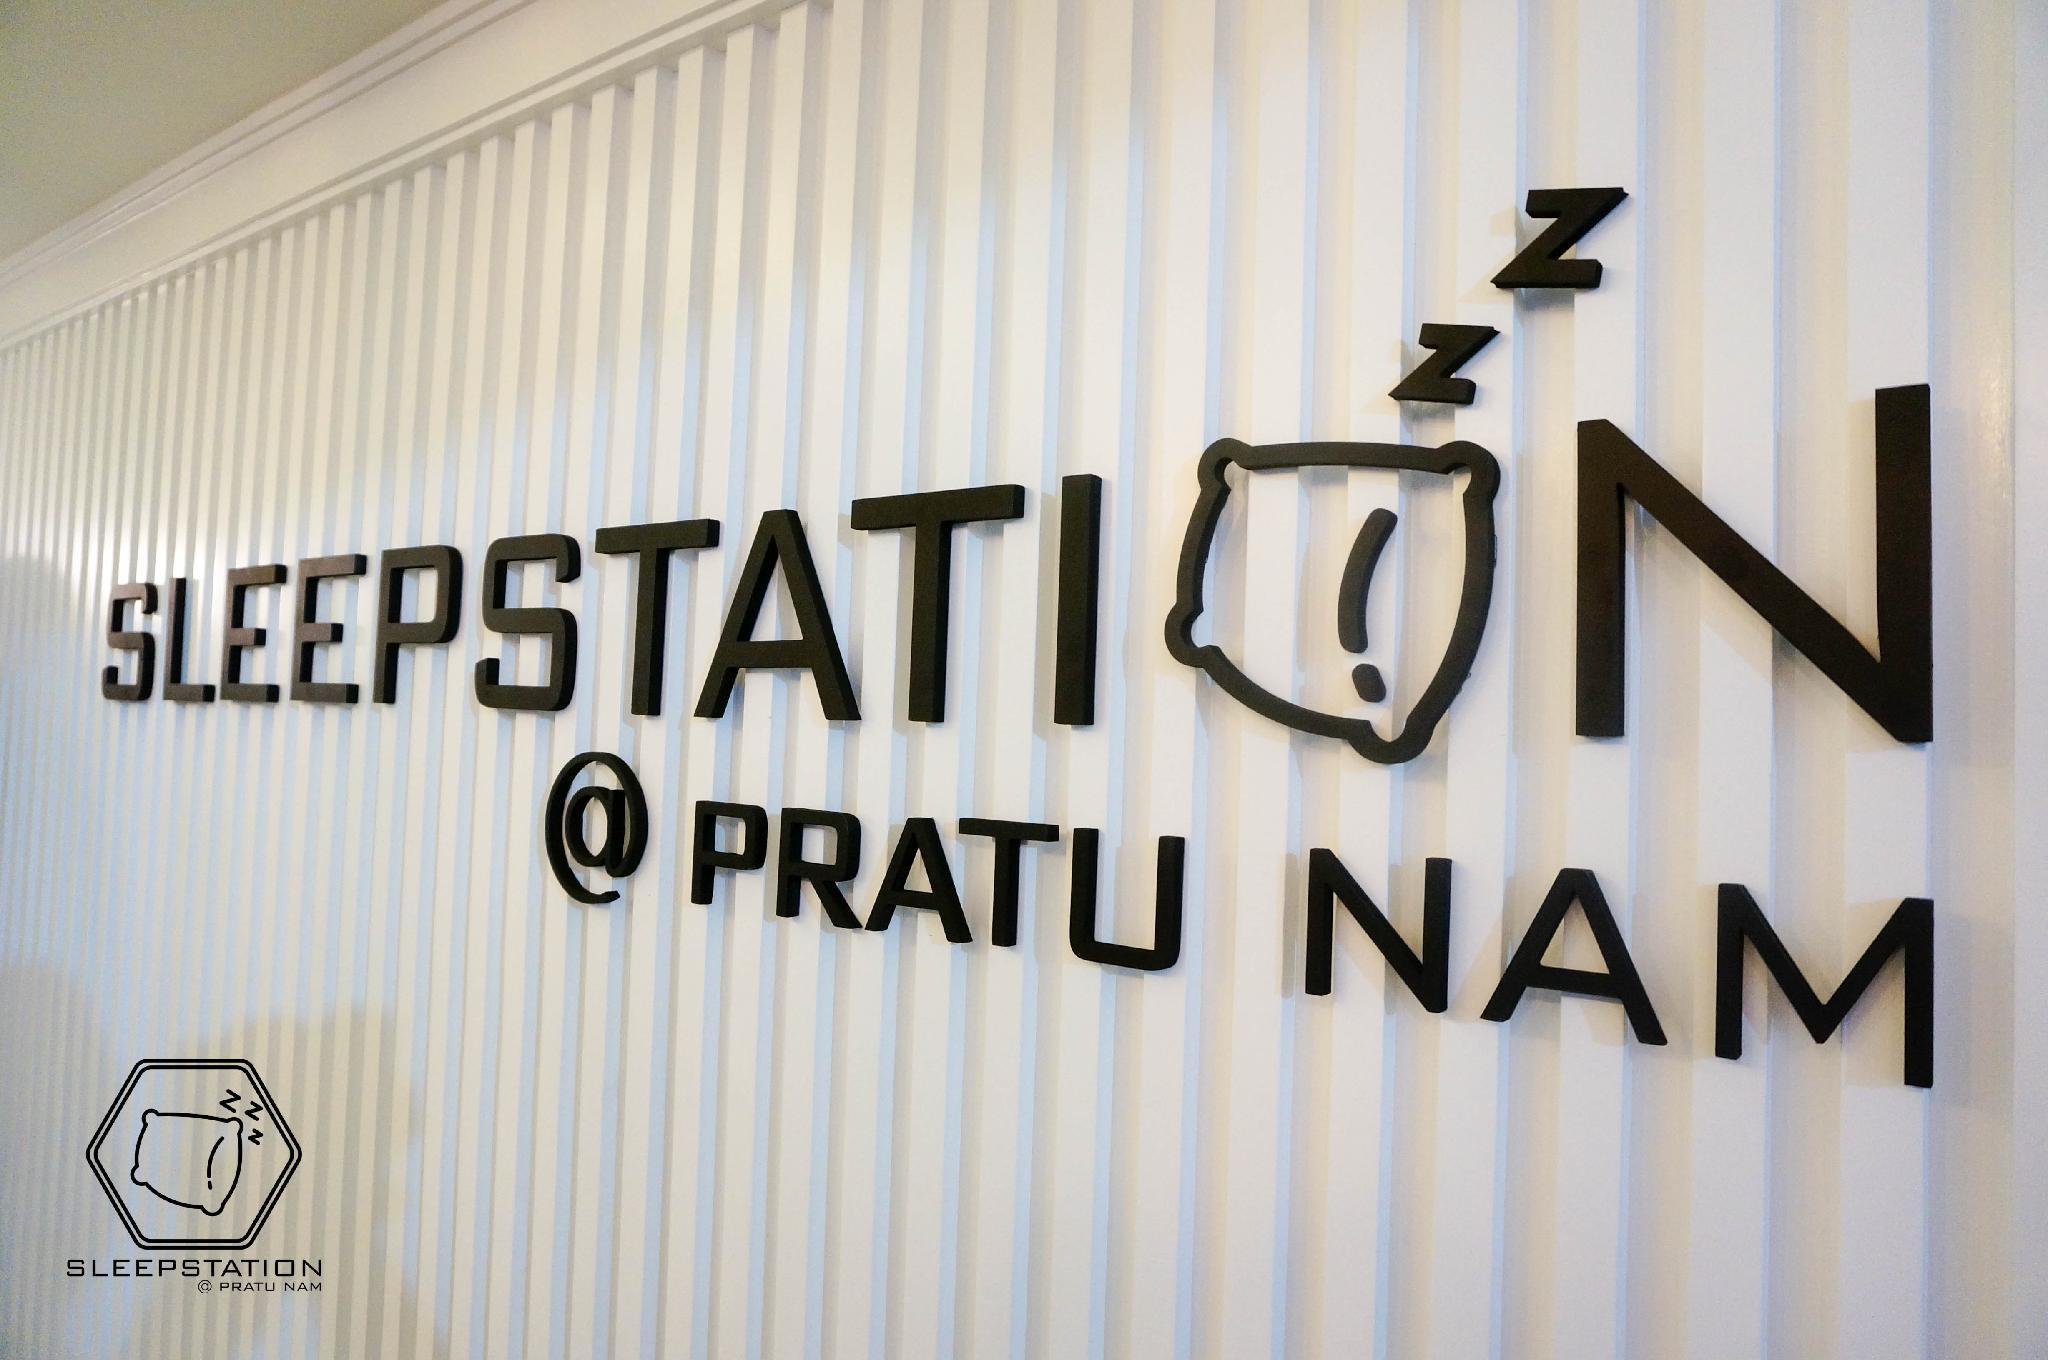 Sleepstation @pratunam,Sleepstation @pratunam